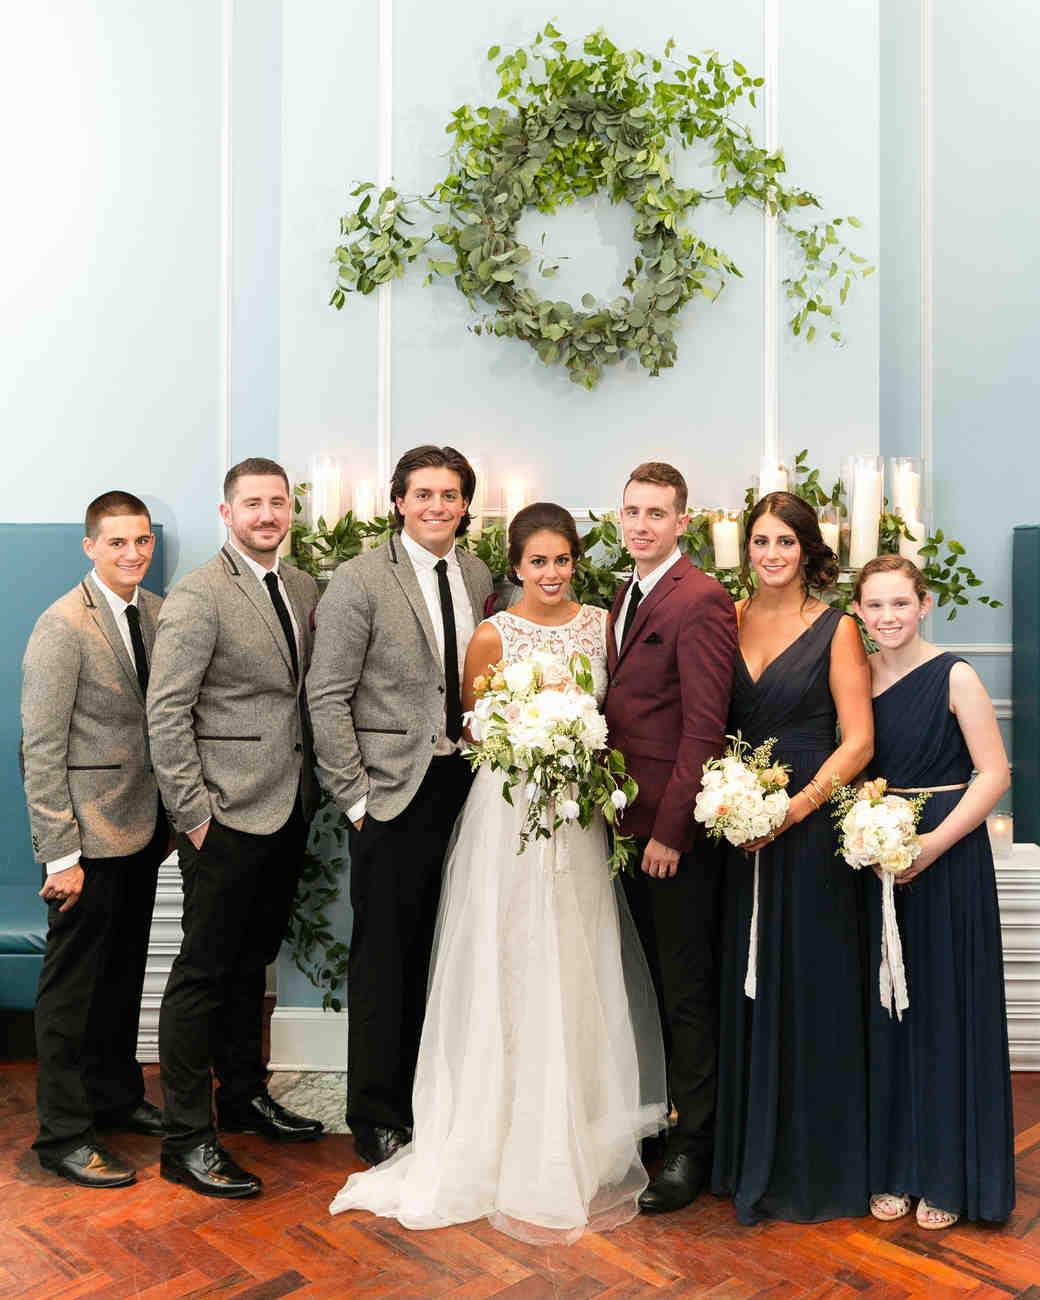 bianca-bryen-wedding-bridalparty-359-s112509-0216.jpg